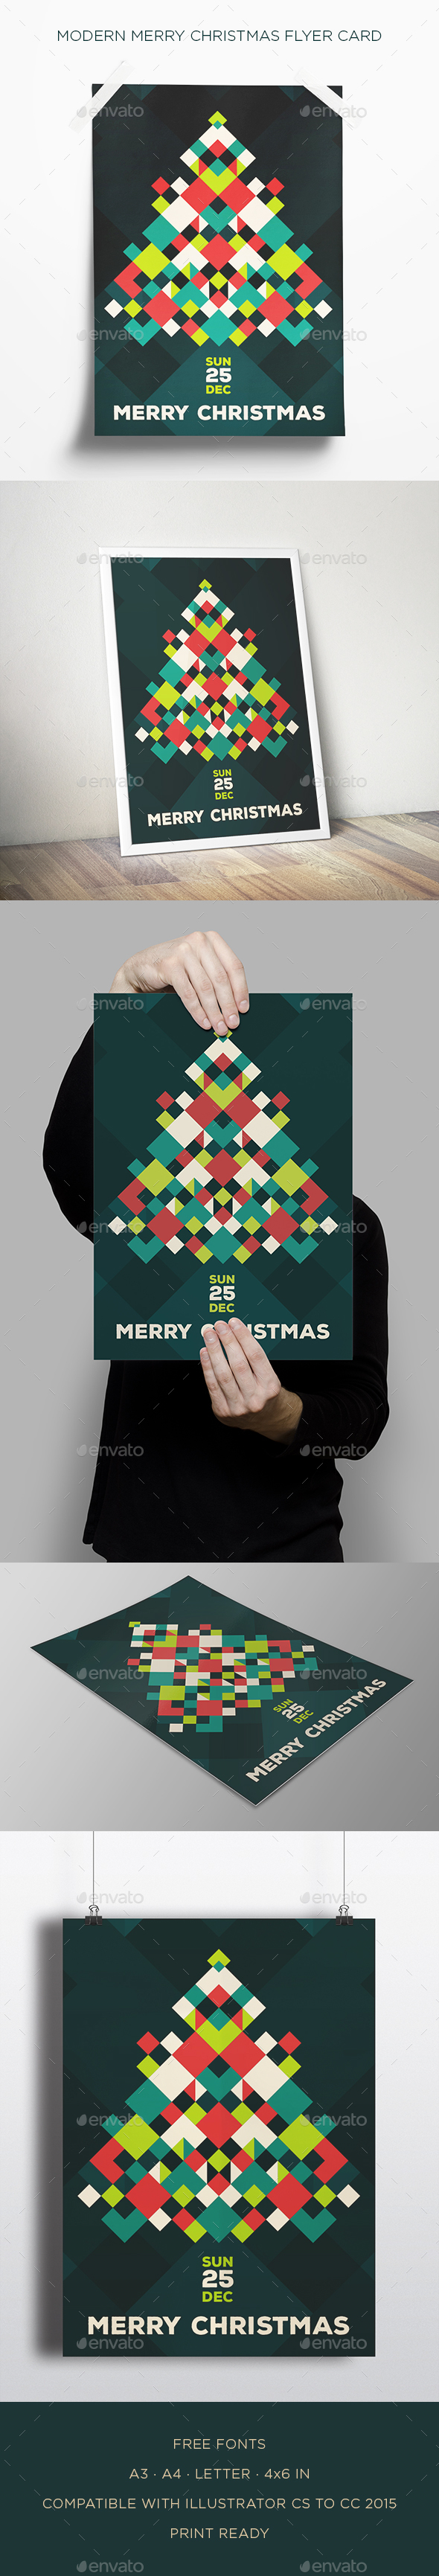 Modern Merry Christmas Flyer Card